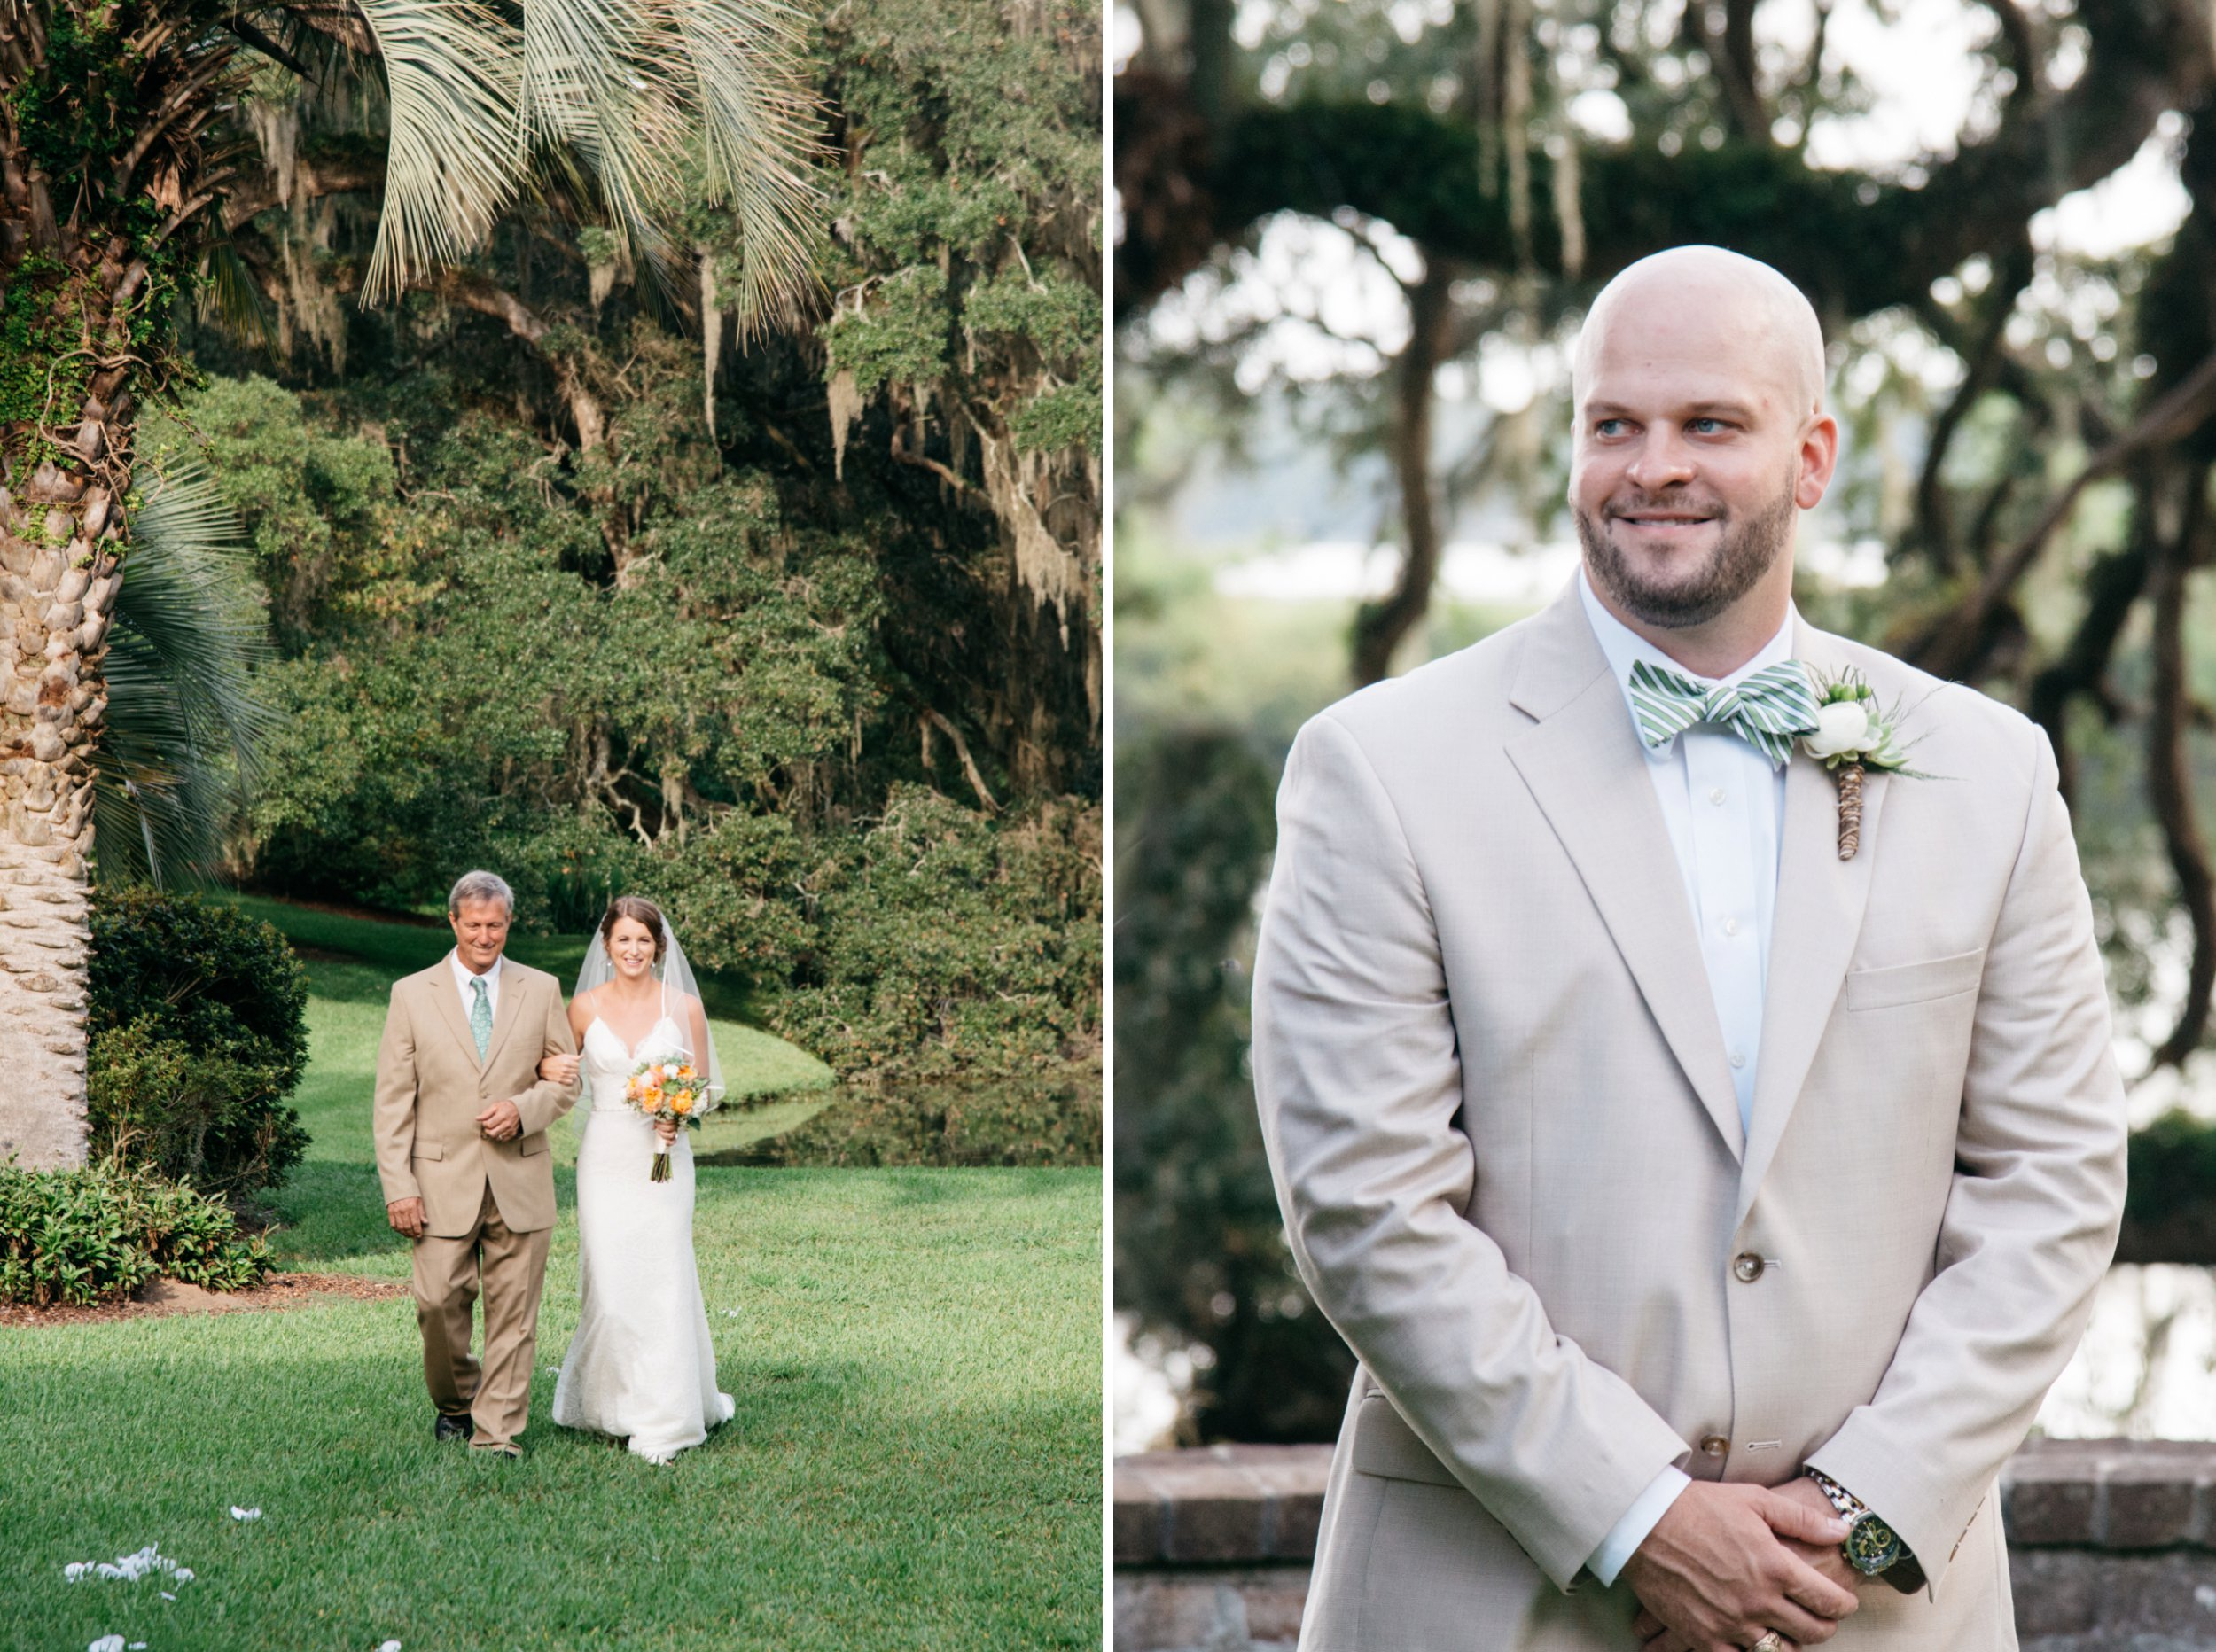 mepkin-abbey-wedding-20.jpg